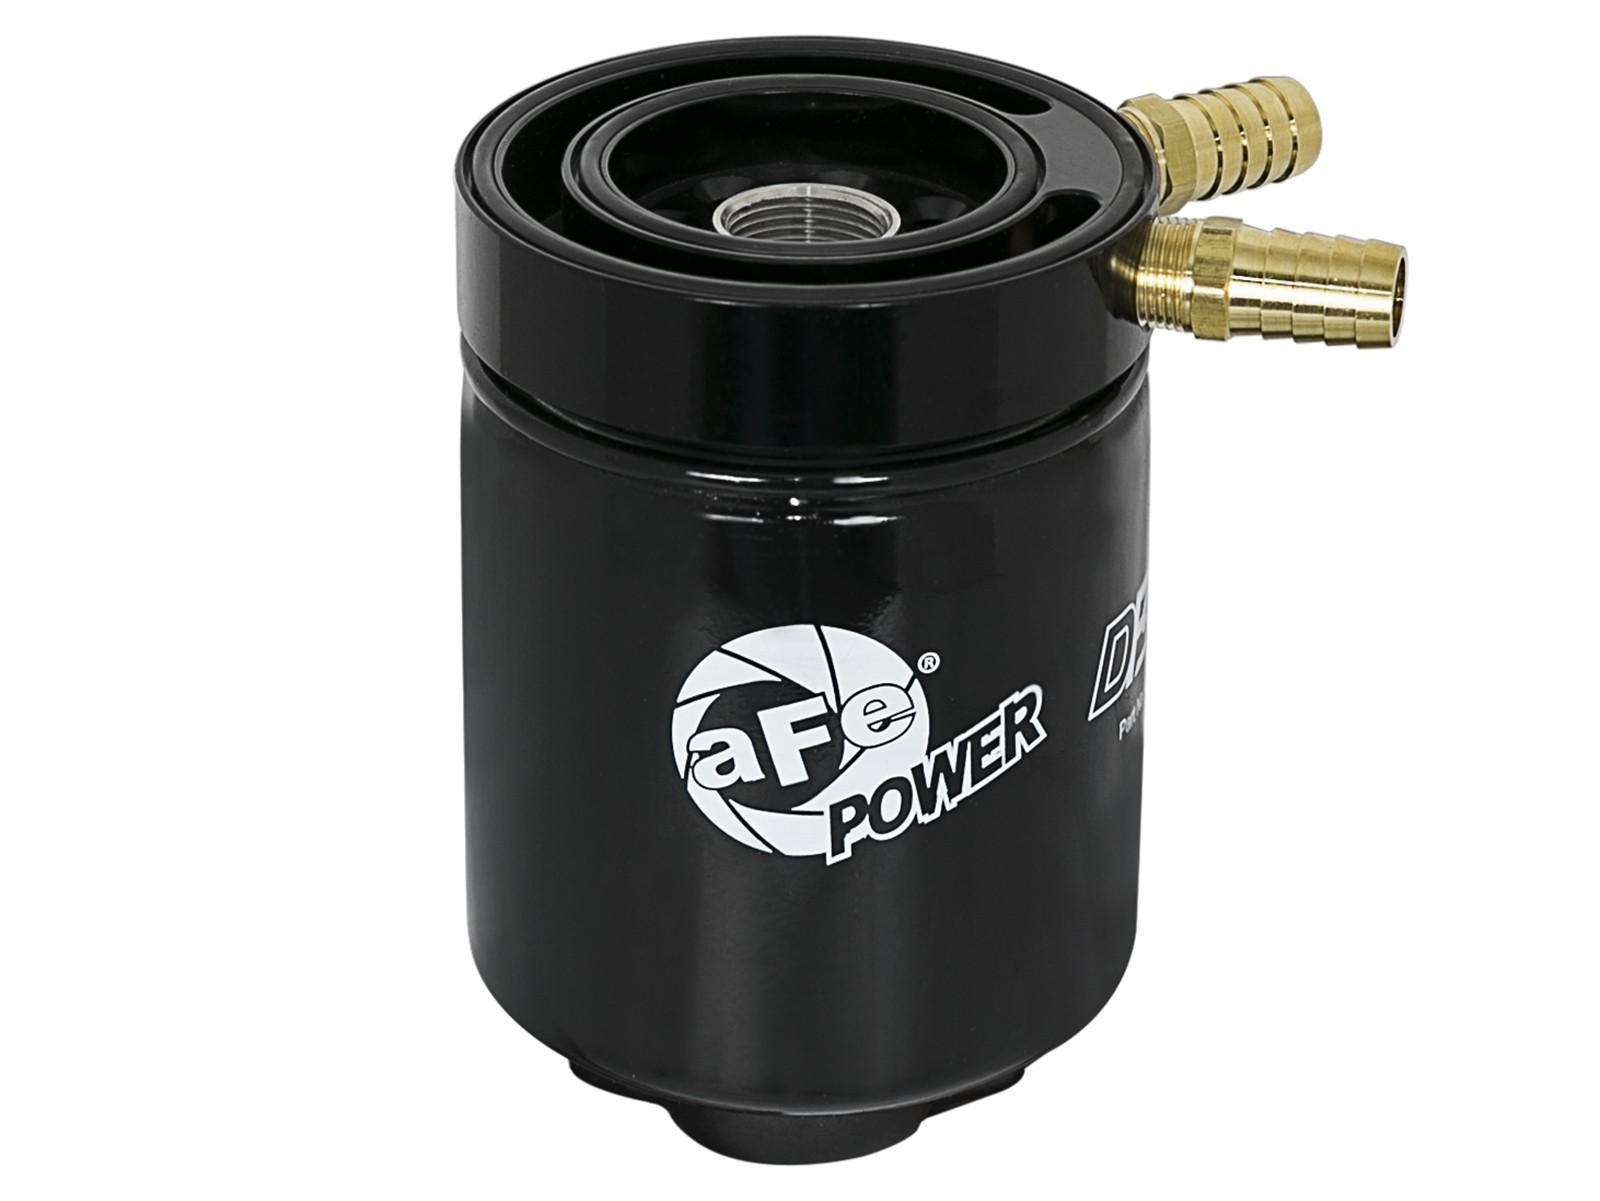 Dfs780 Fuel System Cold Weather Kit Afe Power Polaris Diesel Filter Next